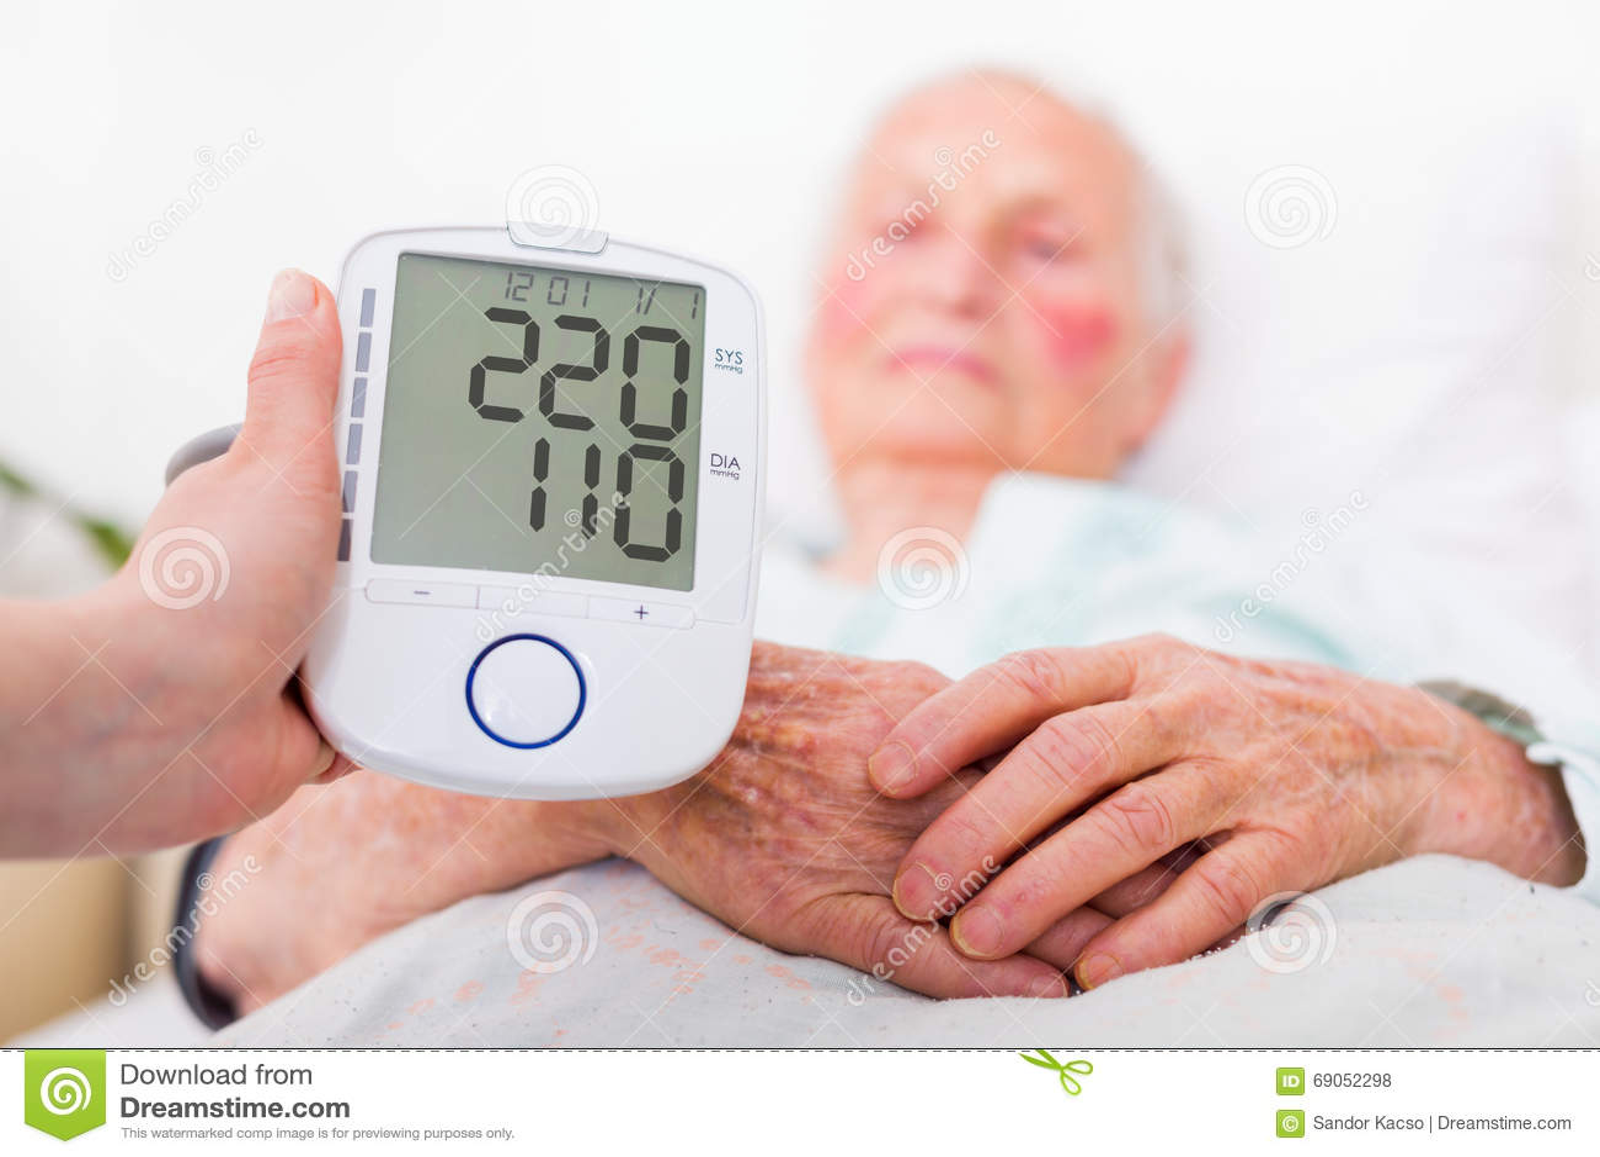 Stroke danger - high blood pressure